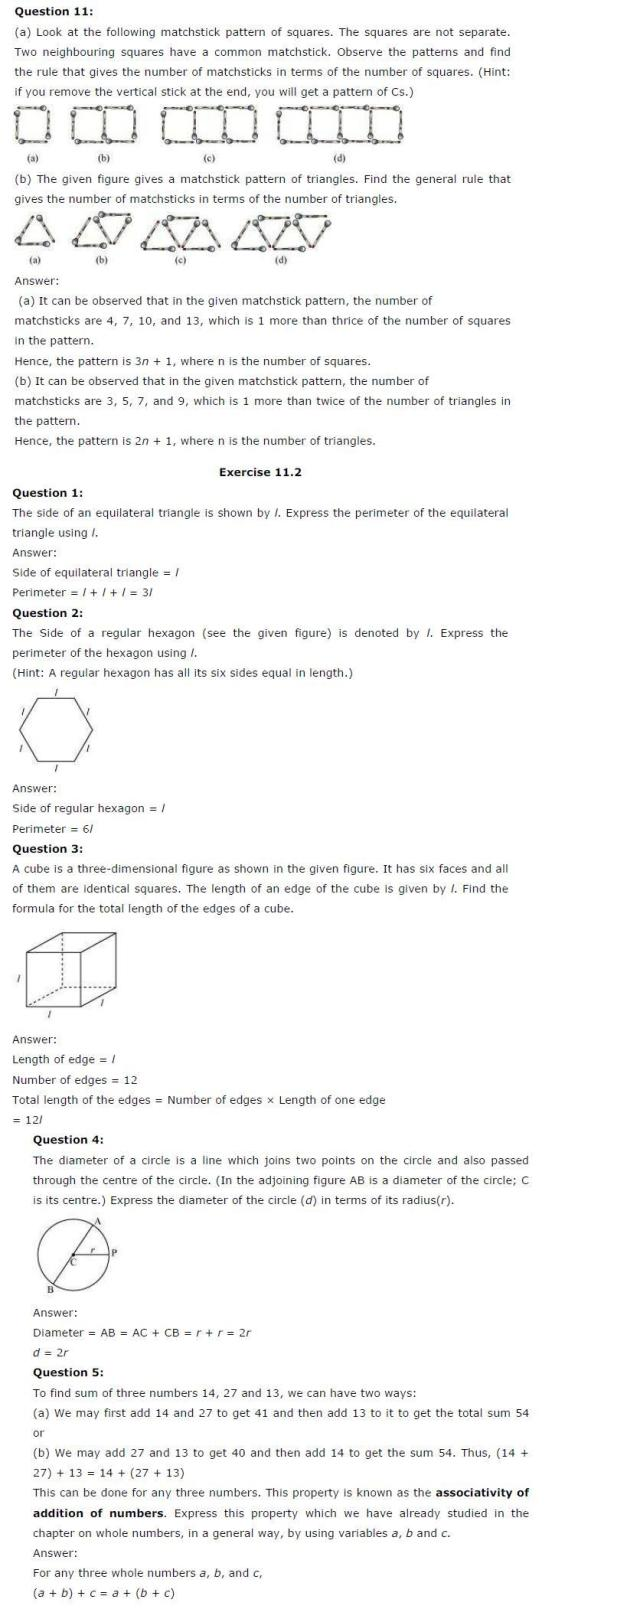 NCERT Solutions for Class 6th Maths 11 3